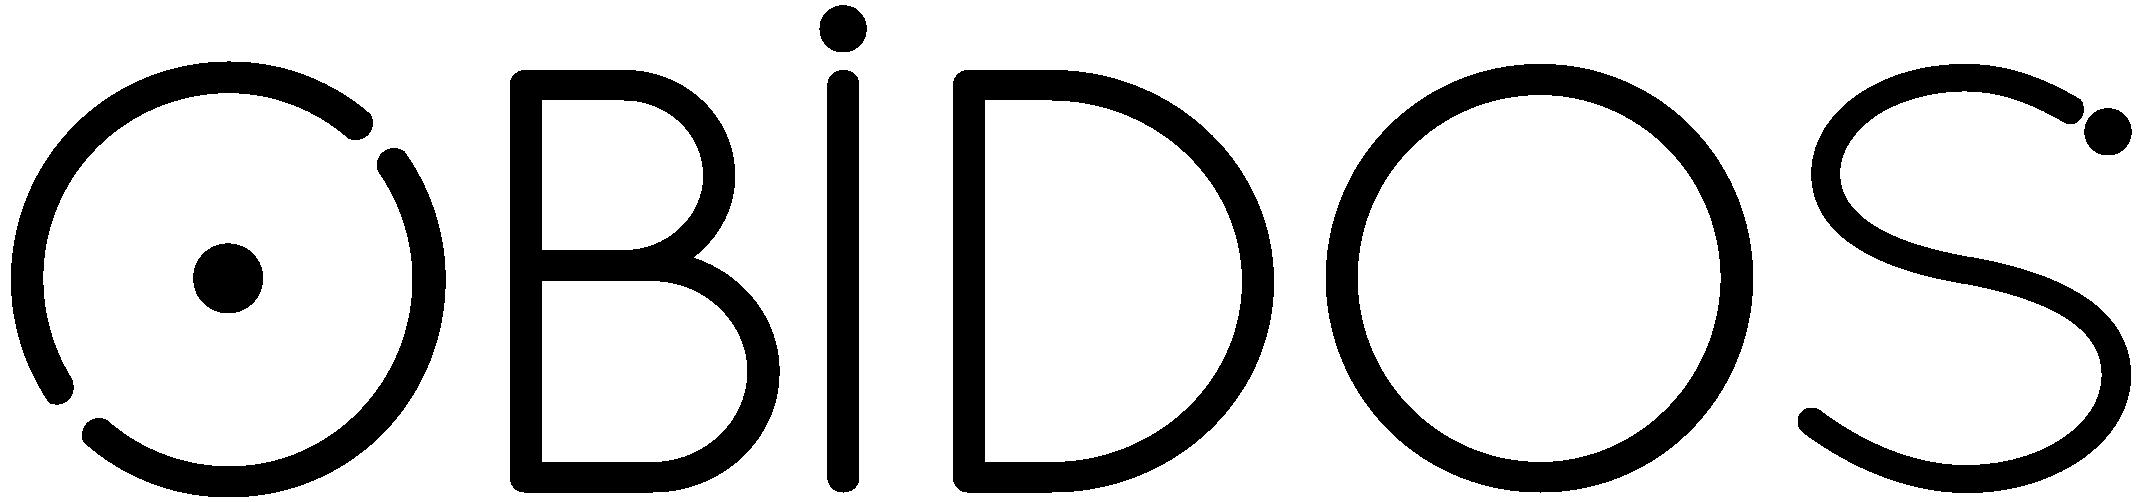 LOGO-principal-preto